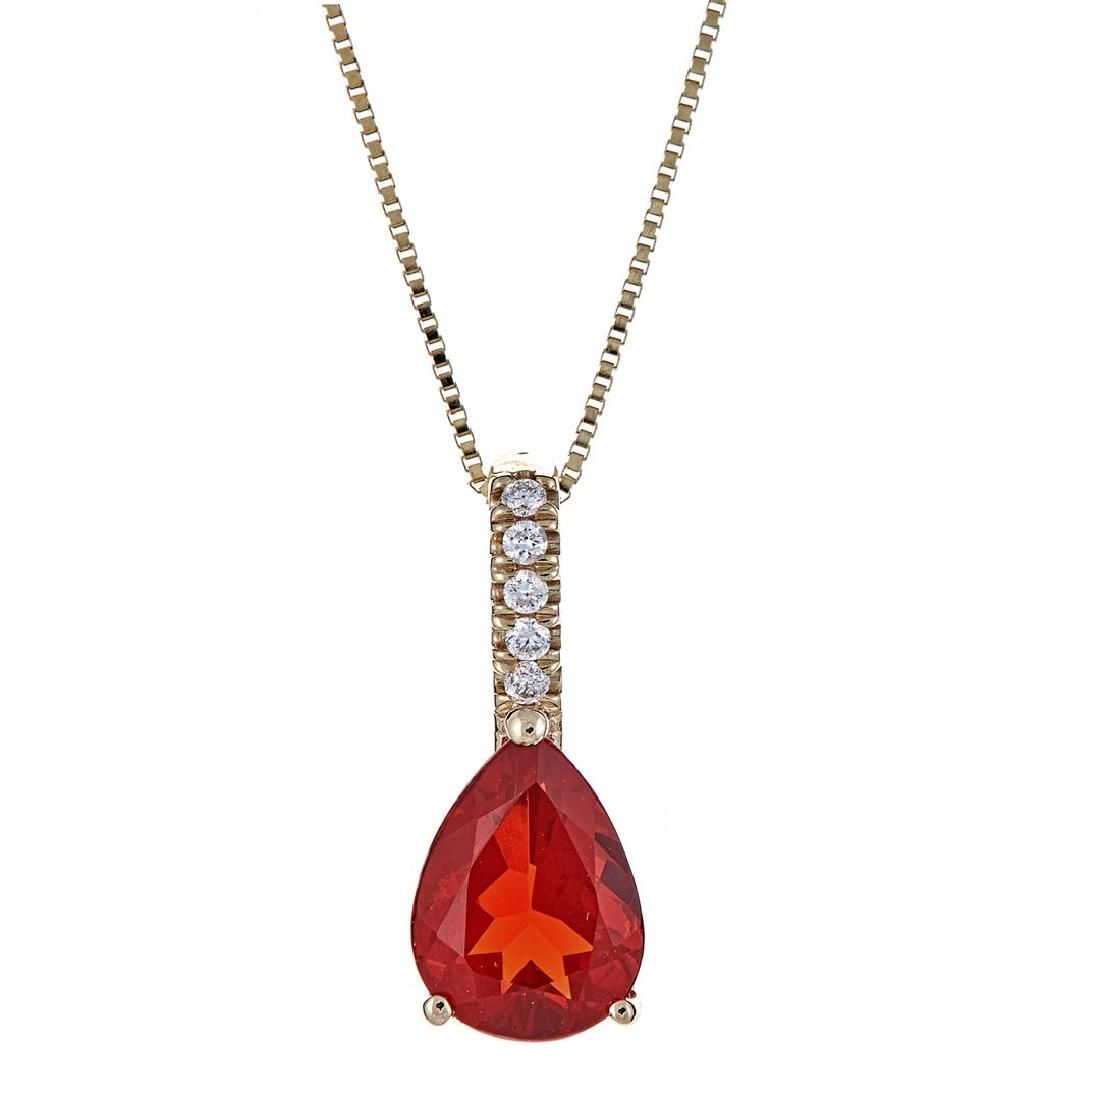 0.78 ctw Fire Opal and Diamond Pendant - 14KT Yellow